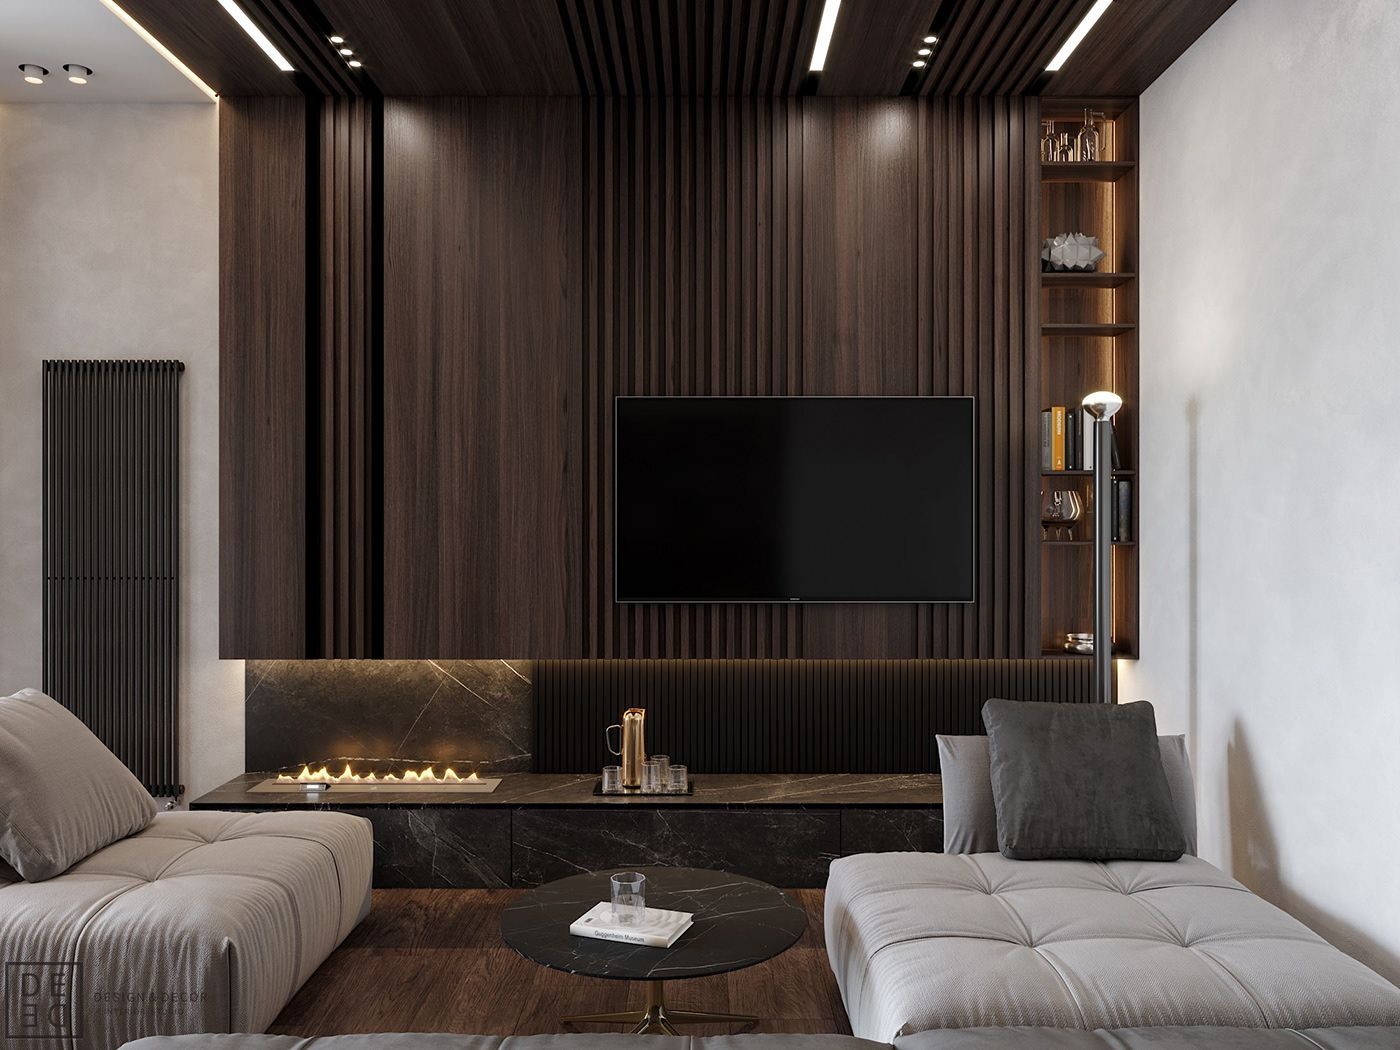 De De Wooden Luxury On Behance Interior Wall Design Wood Slat Wall Living Room Tv